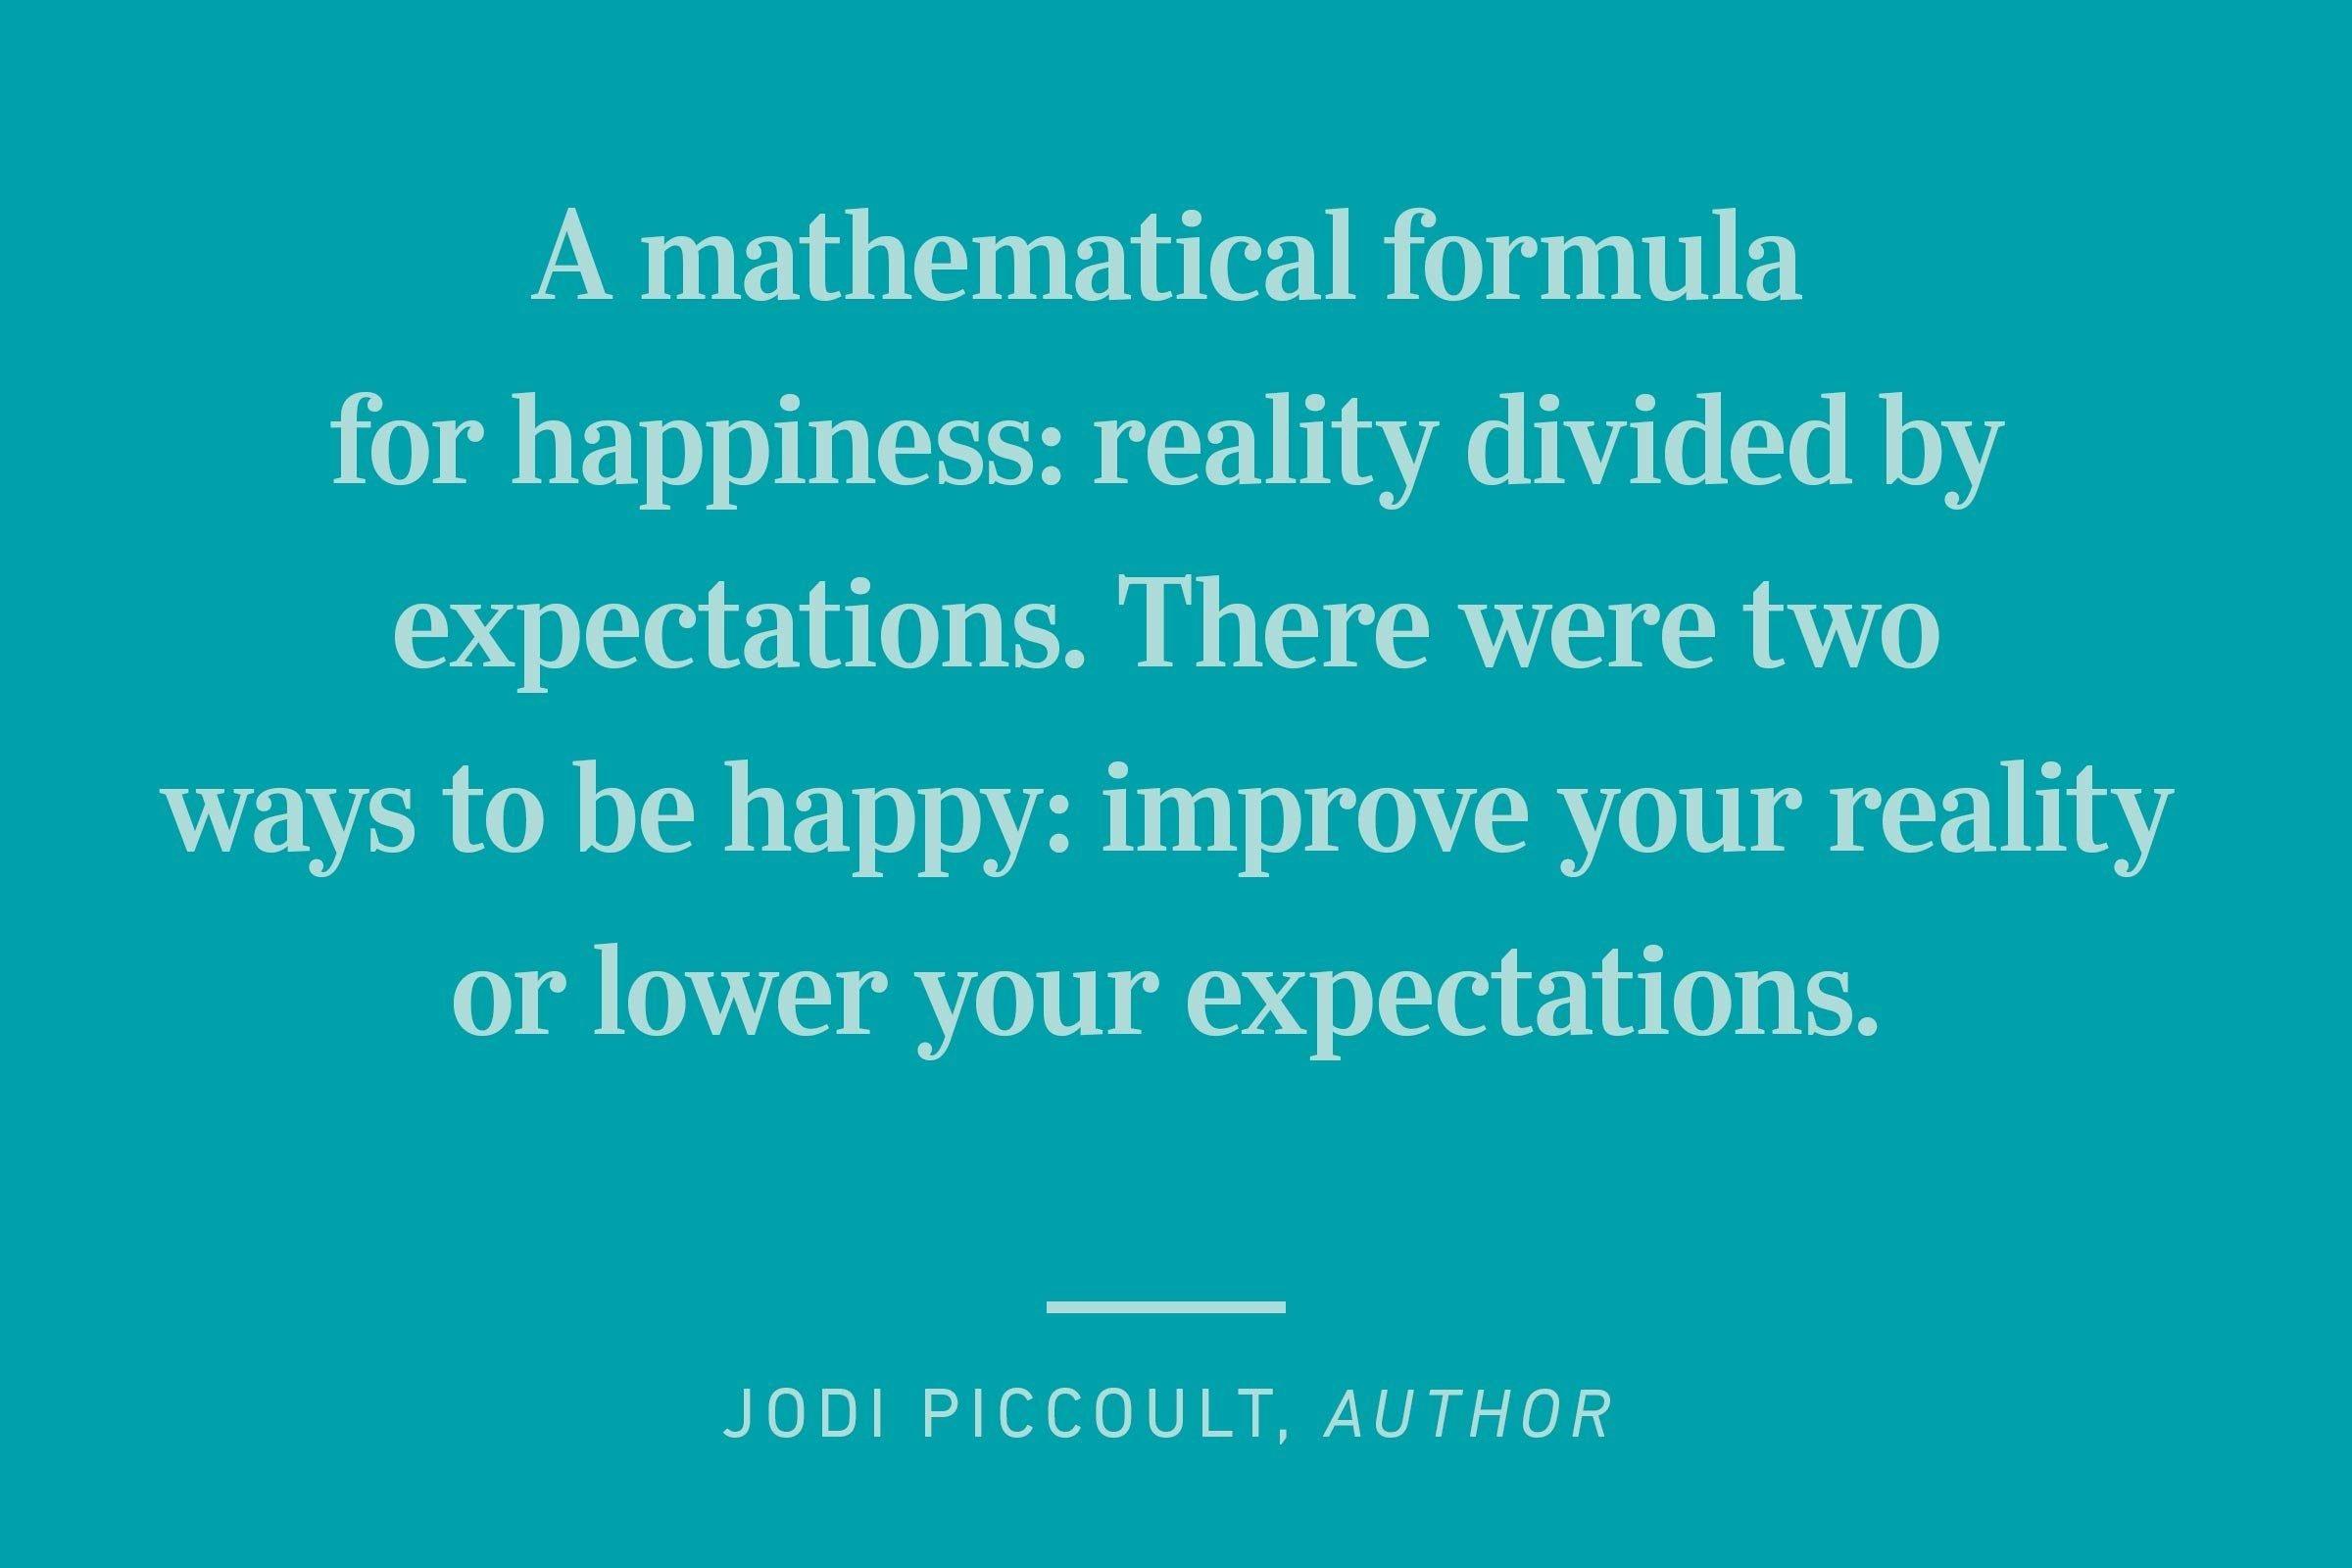 jodi piccoult happiness quote